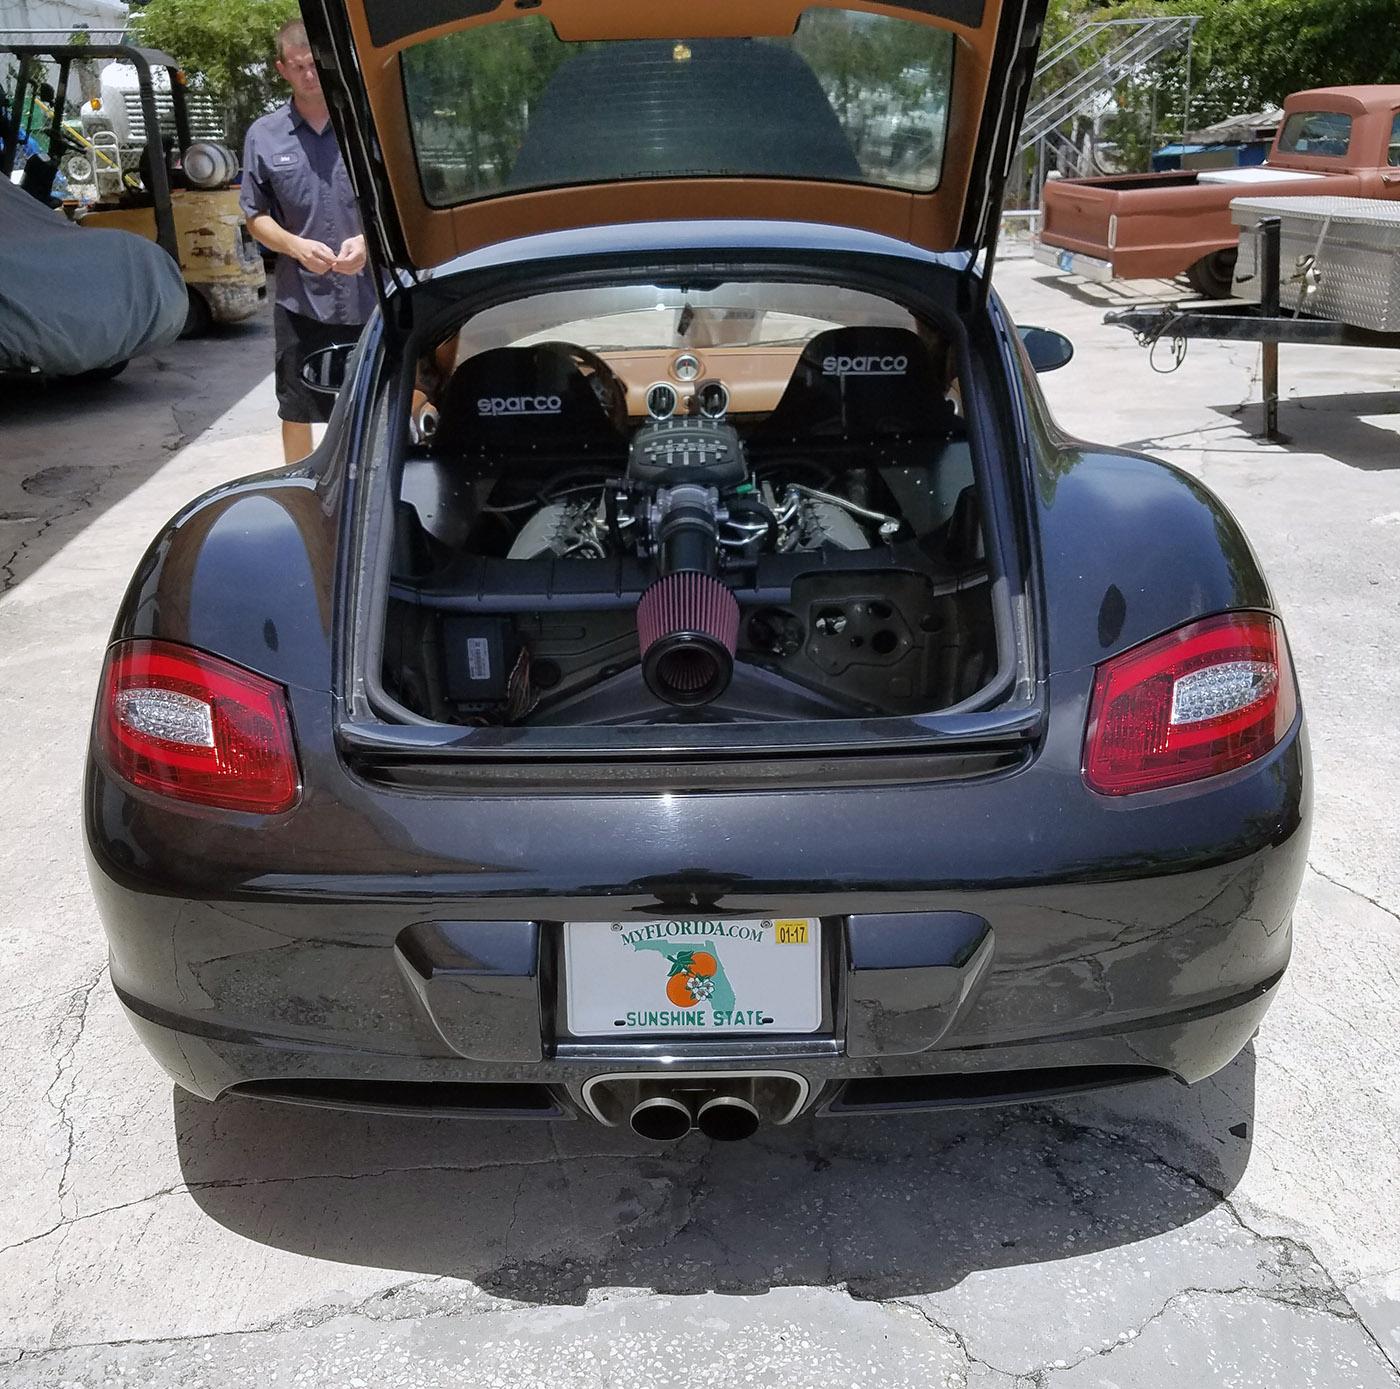 Porsche 911 Engine Swap: Porsche Cayman With A Coyote V8